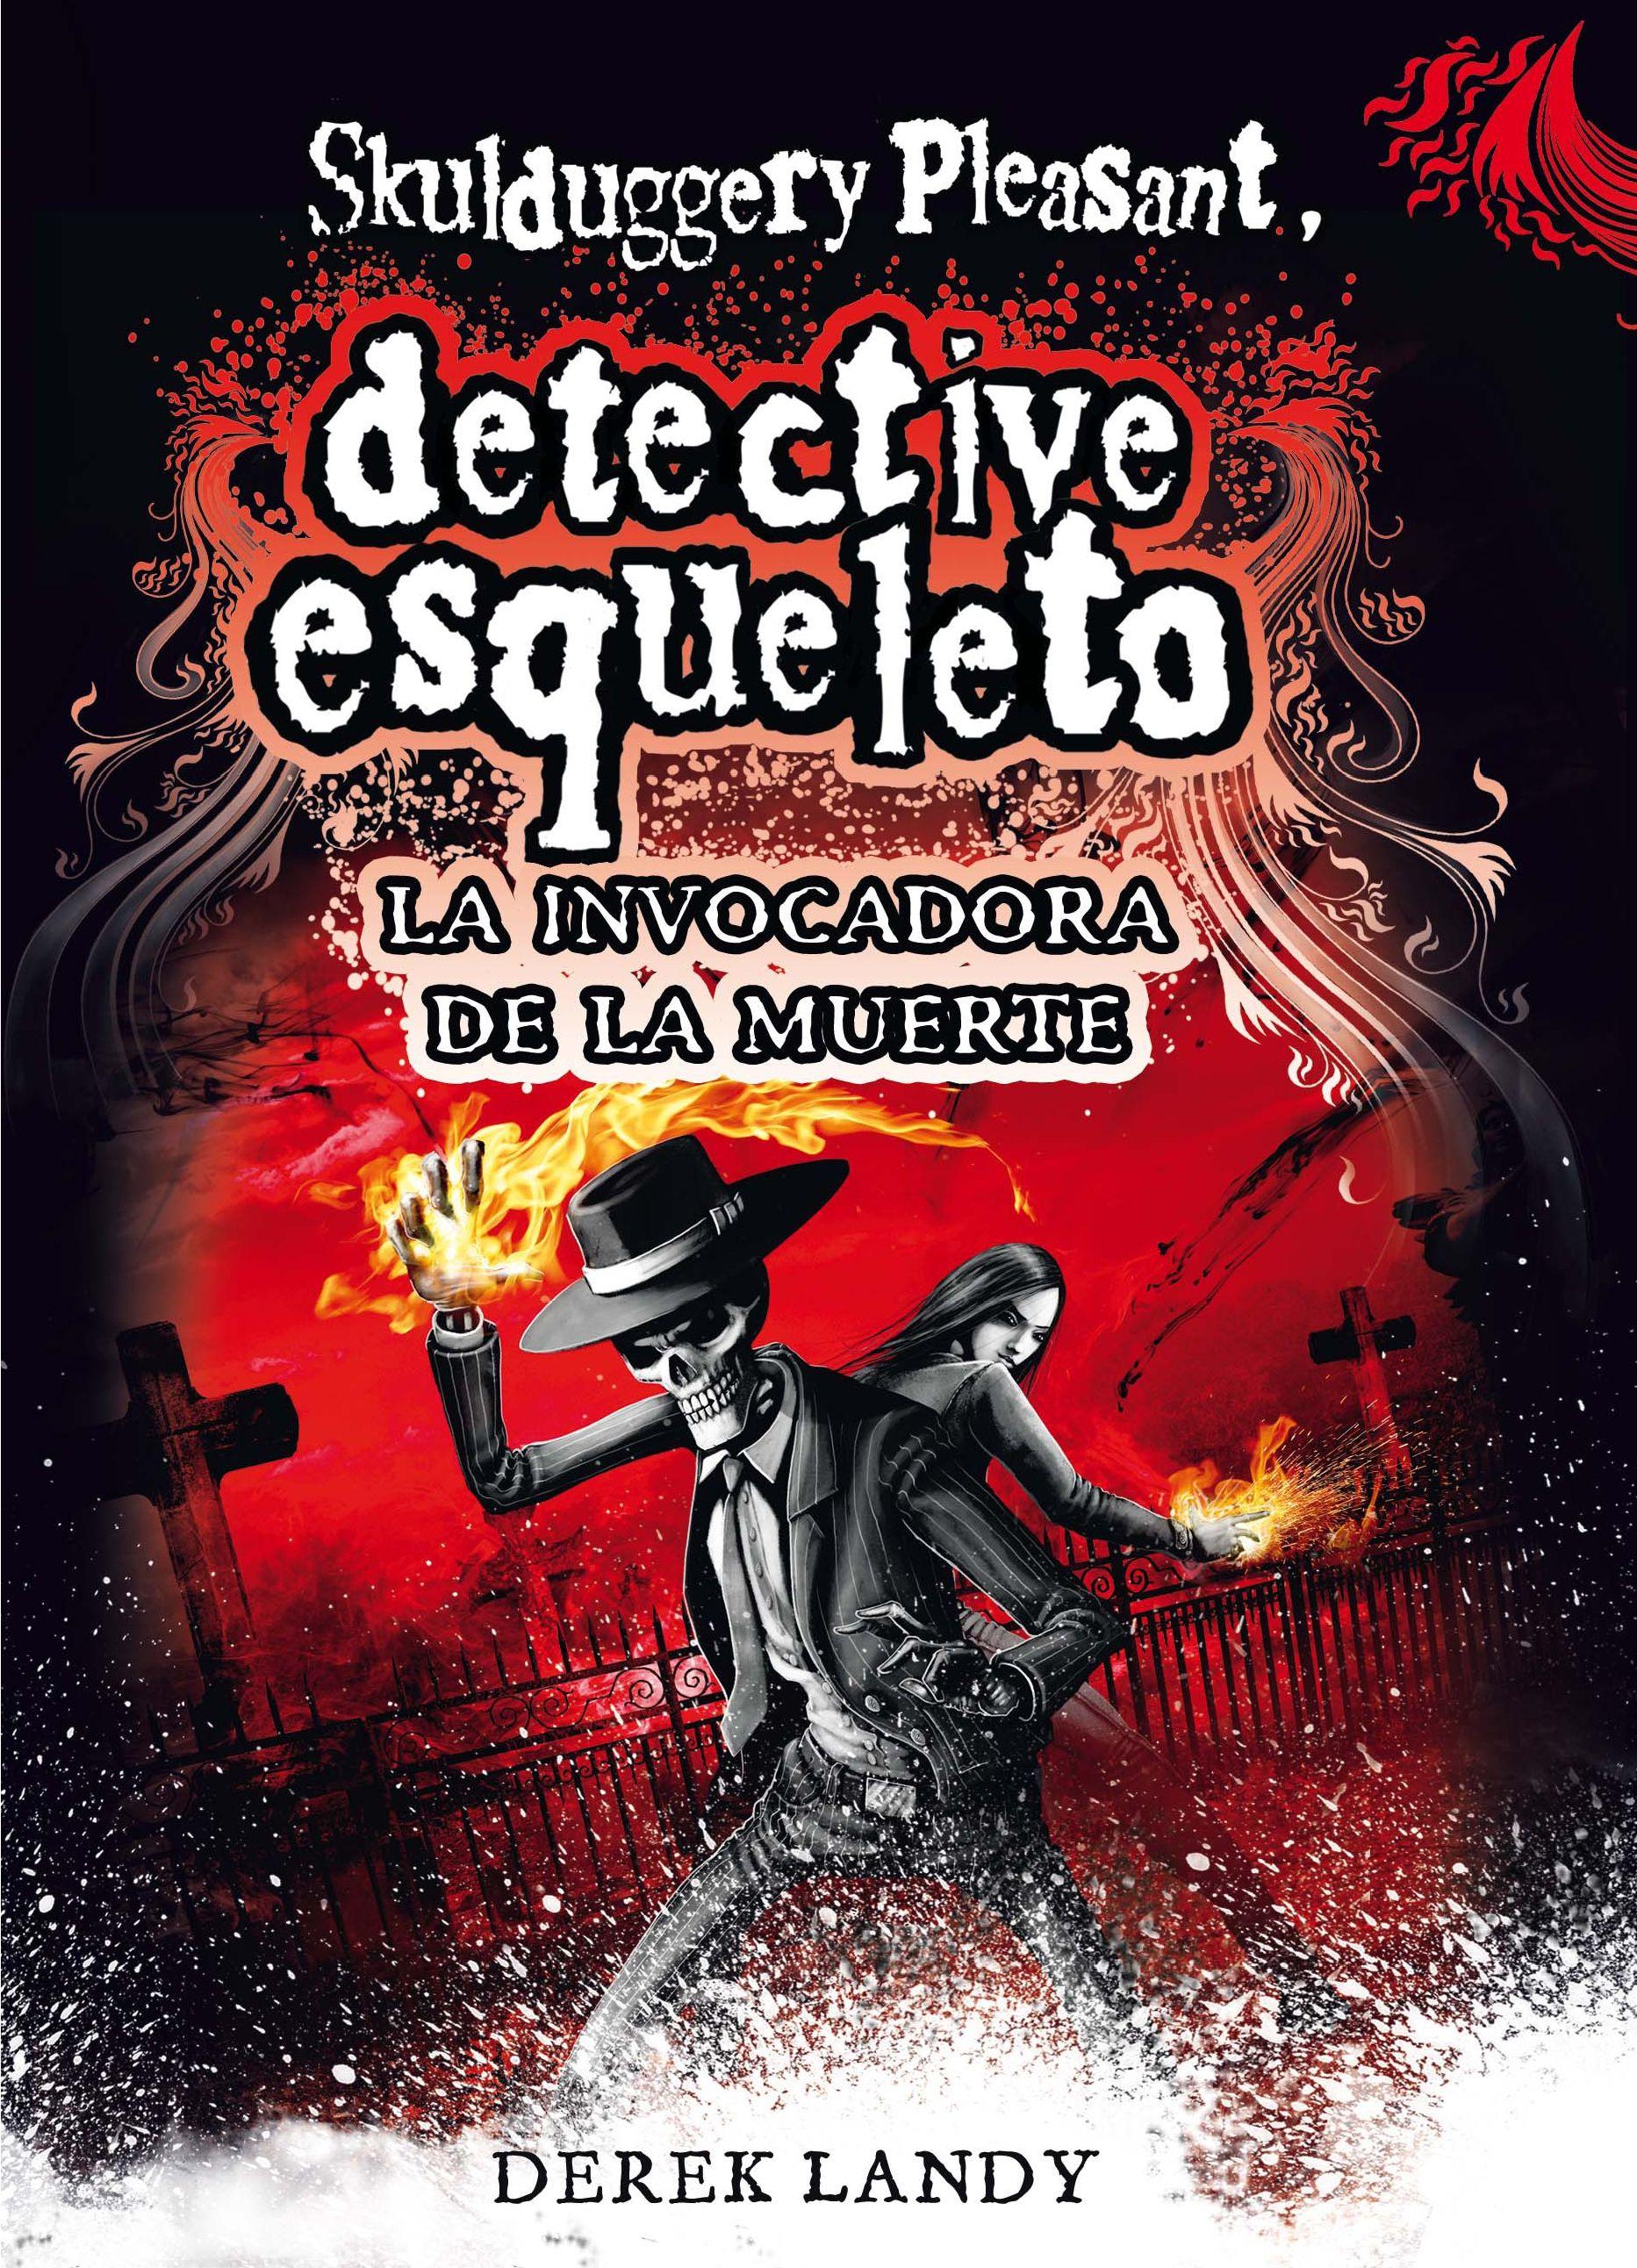 DETECTIVE ESQUELETO 6 LA INVOCADORA DE LA MUERTE [SKULDUGGERY PLEASANT]